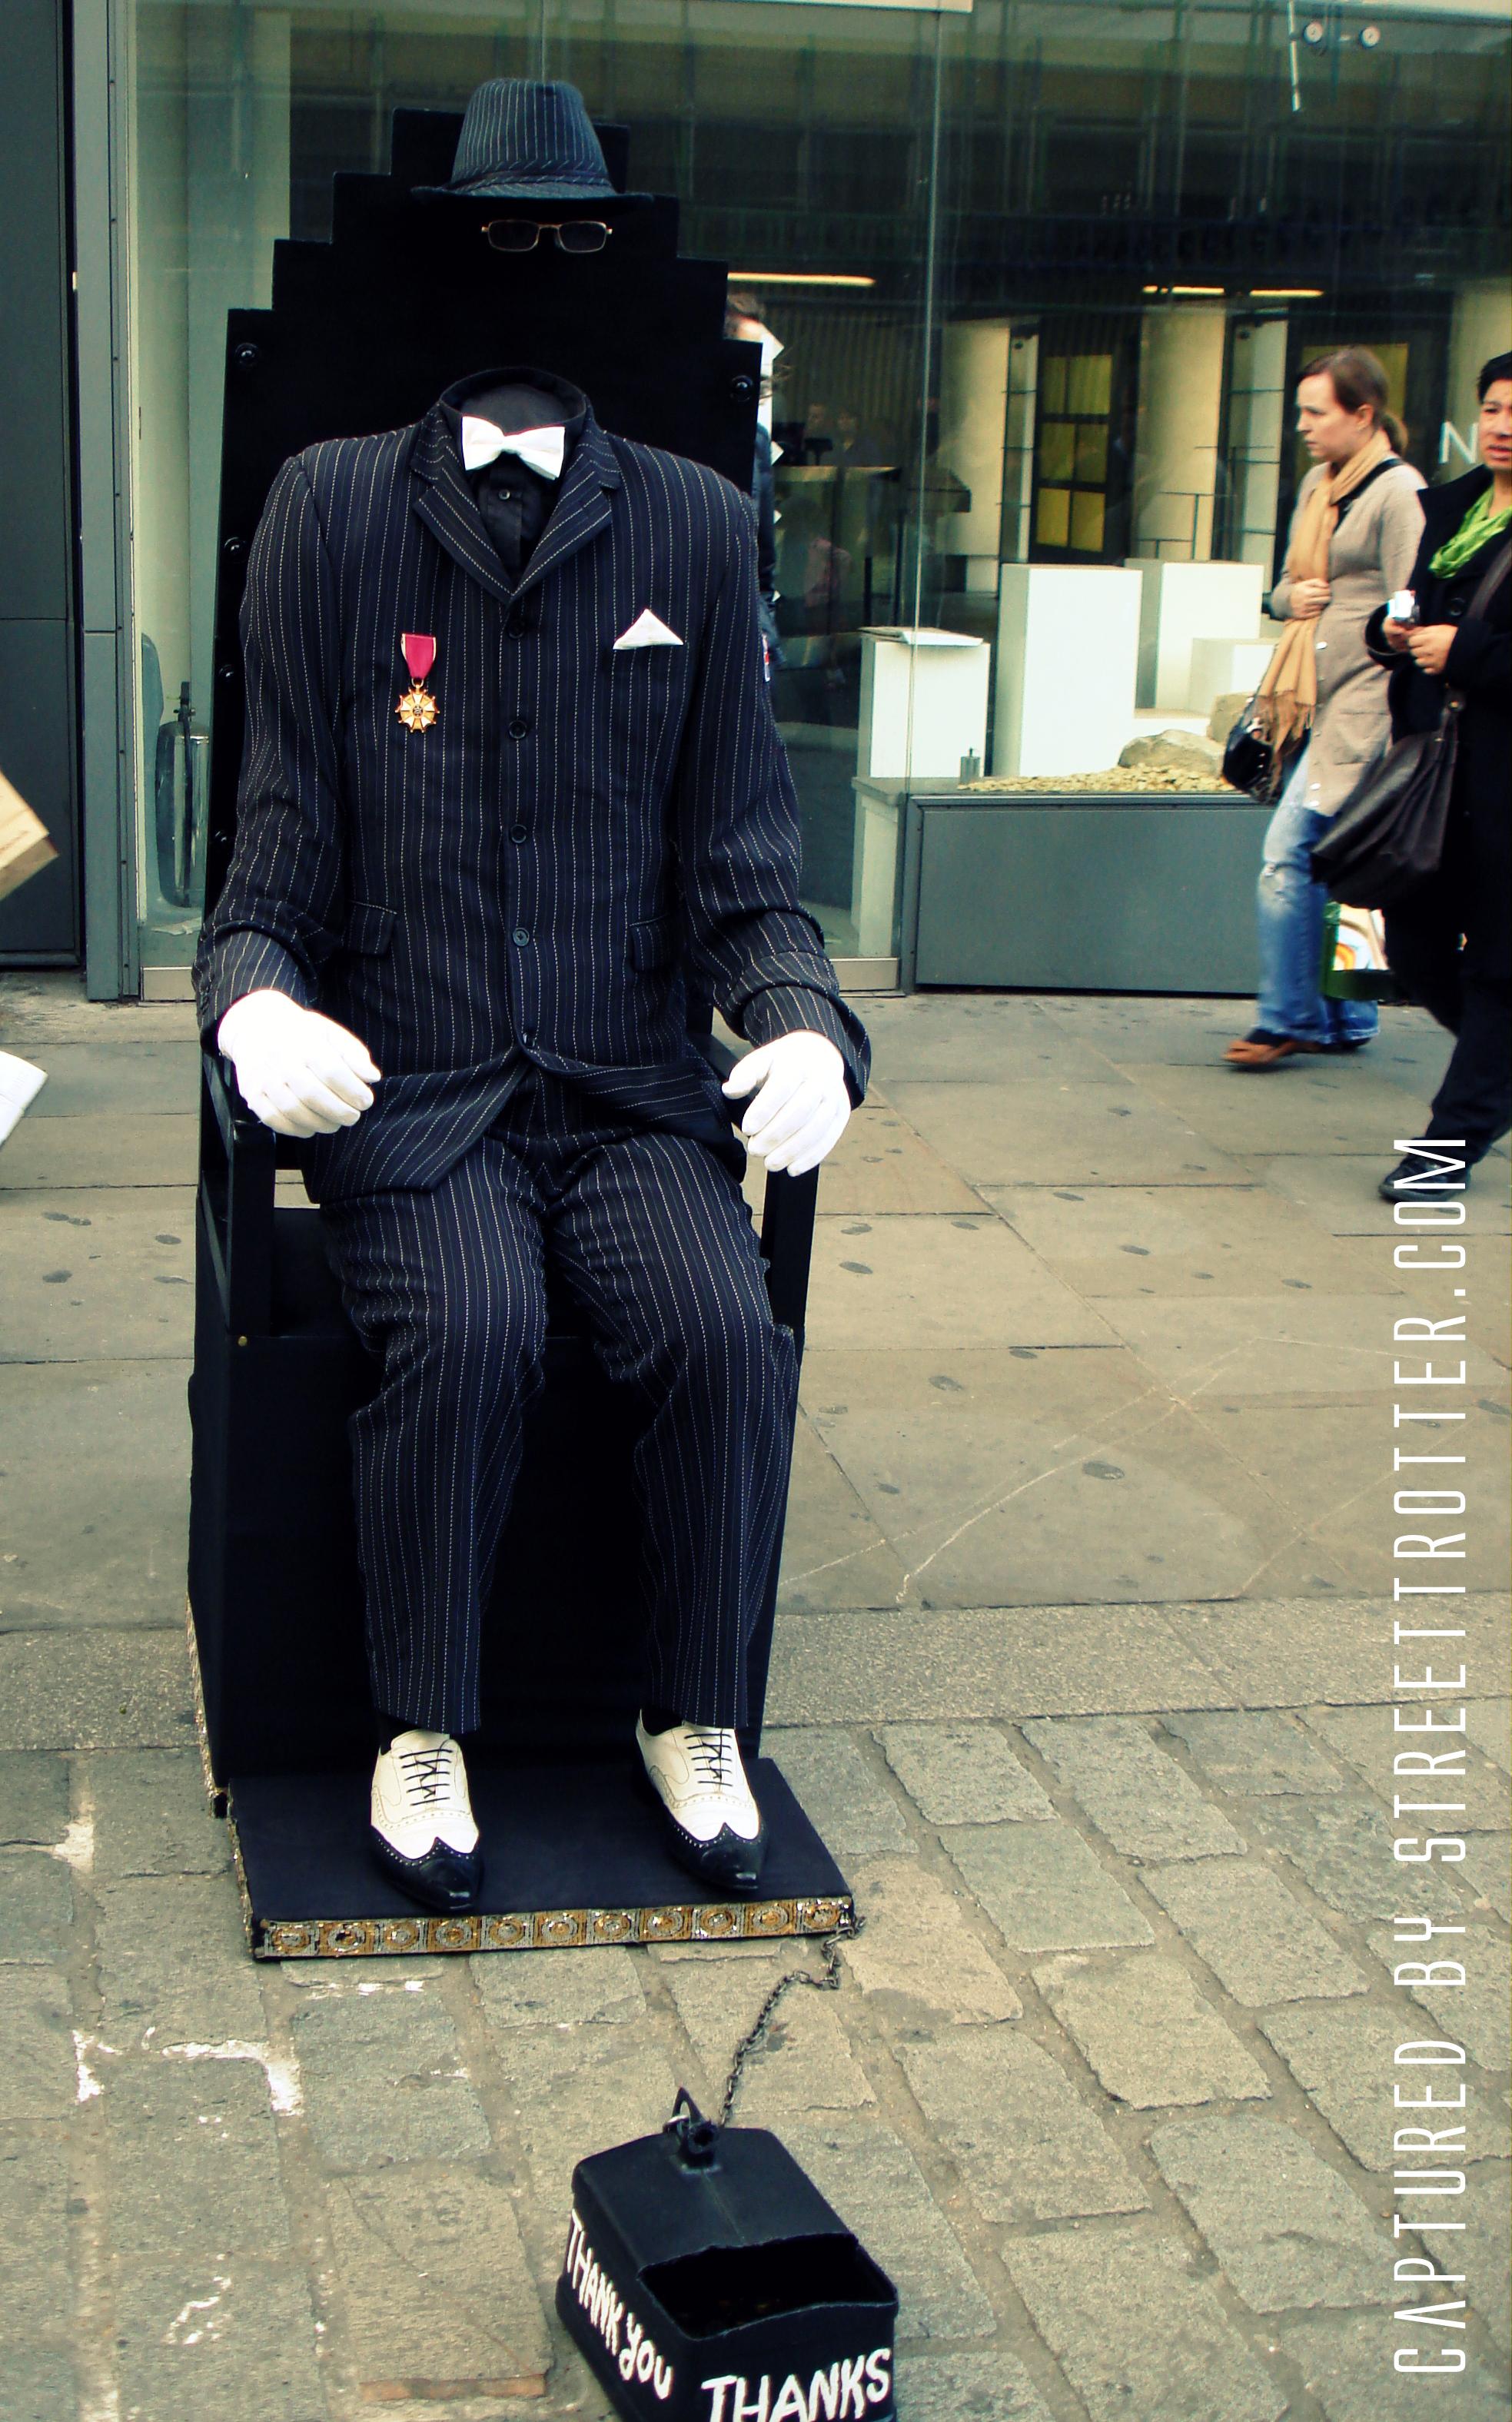 street magic - busking - street trotter